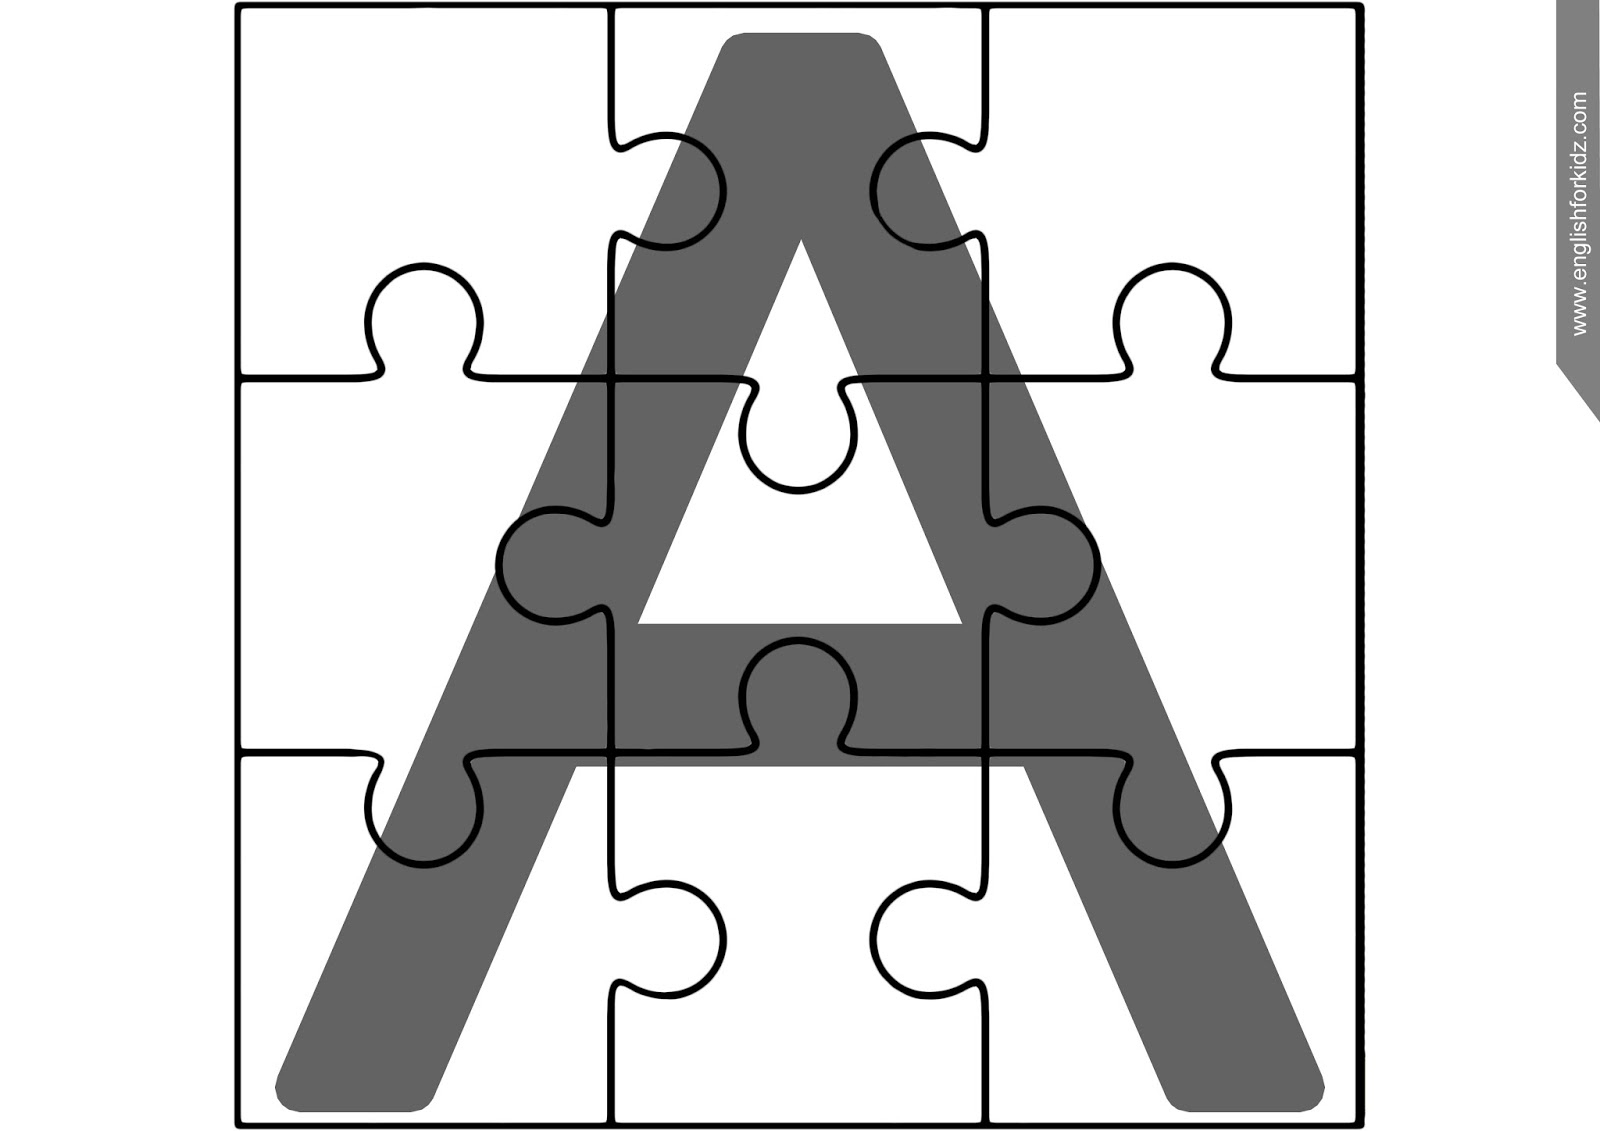 Printable Abc Puzzles - Printable Letter Puzzle